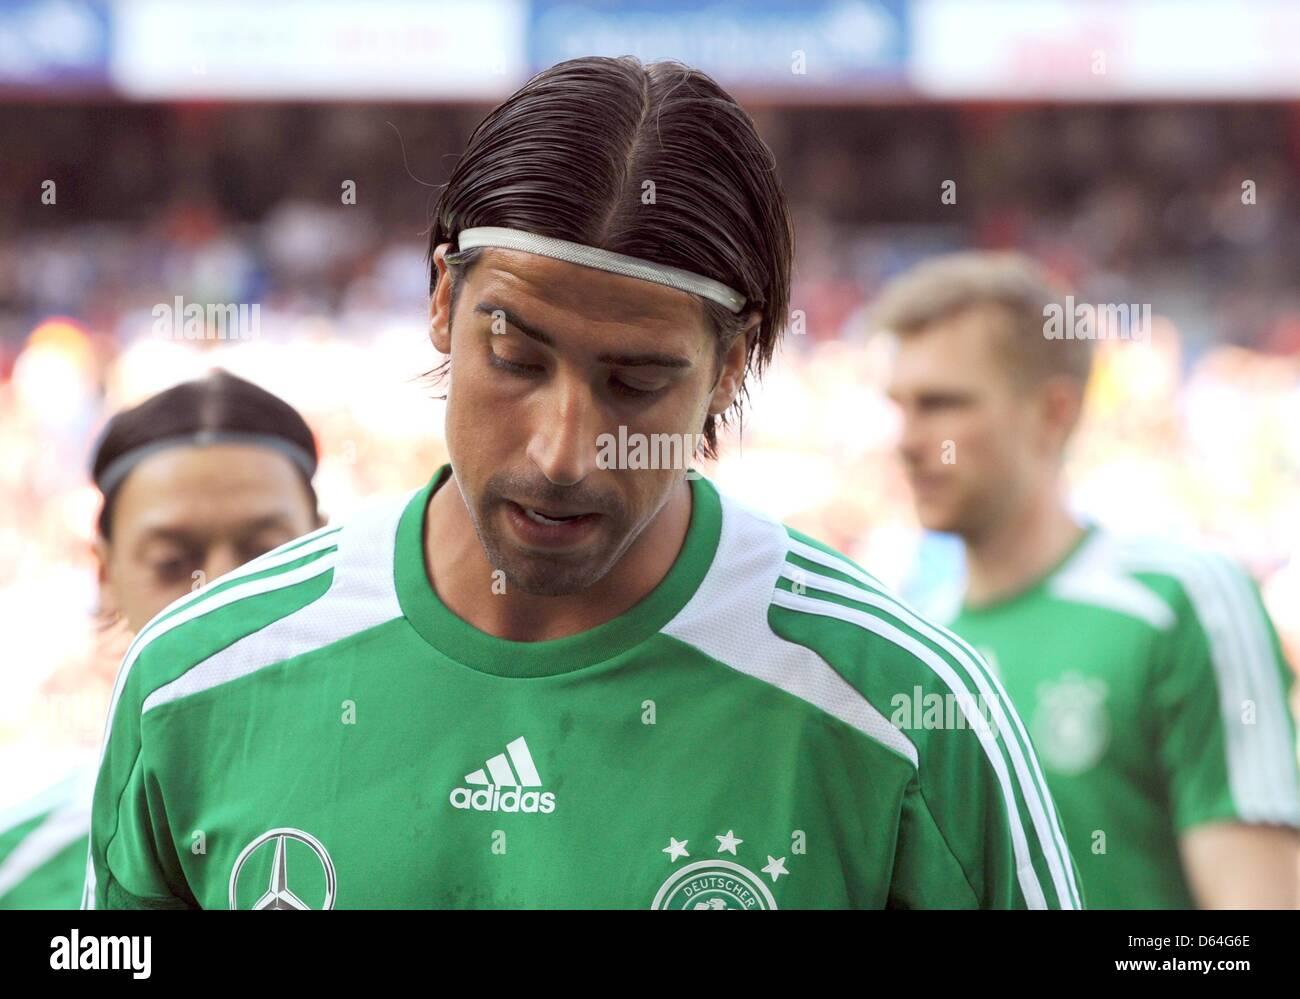 Per Mertesacker Sami Khedira Mesut Stock Photos   Per Mertesacker ... 71d12feb0bec4